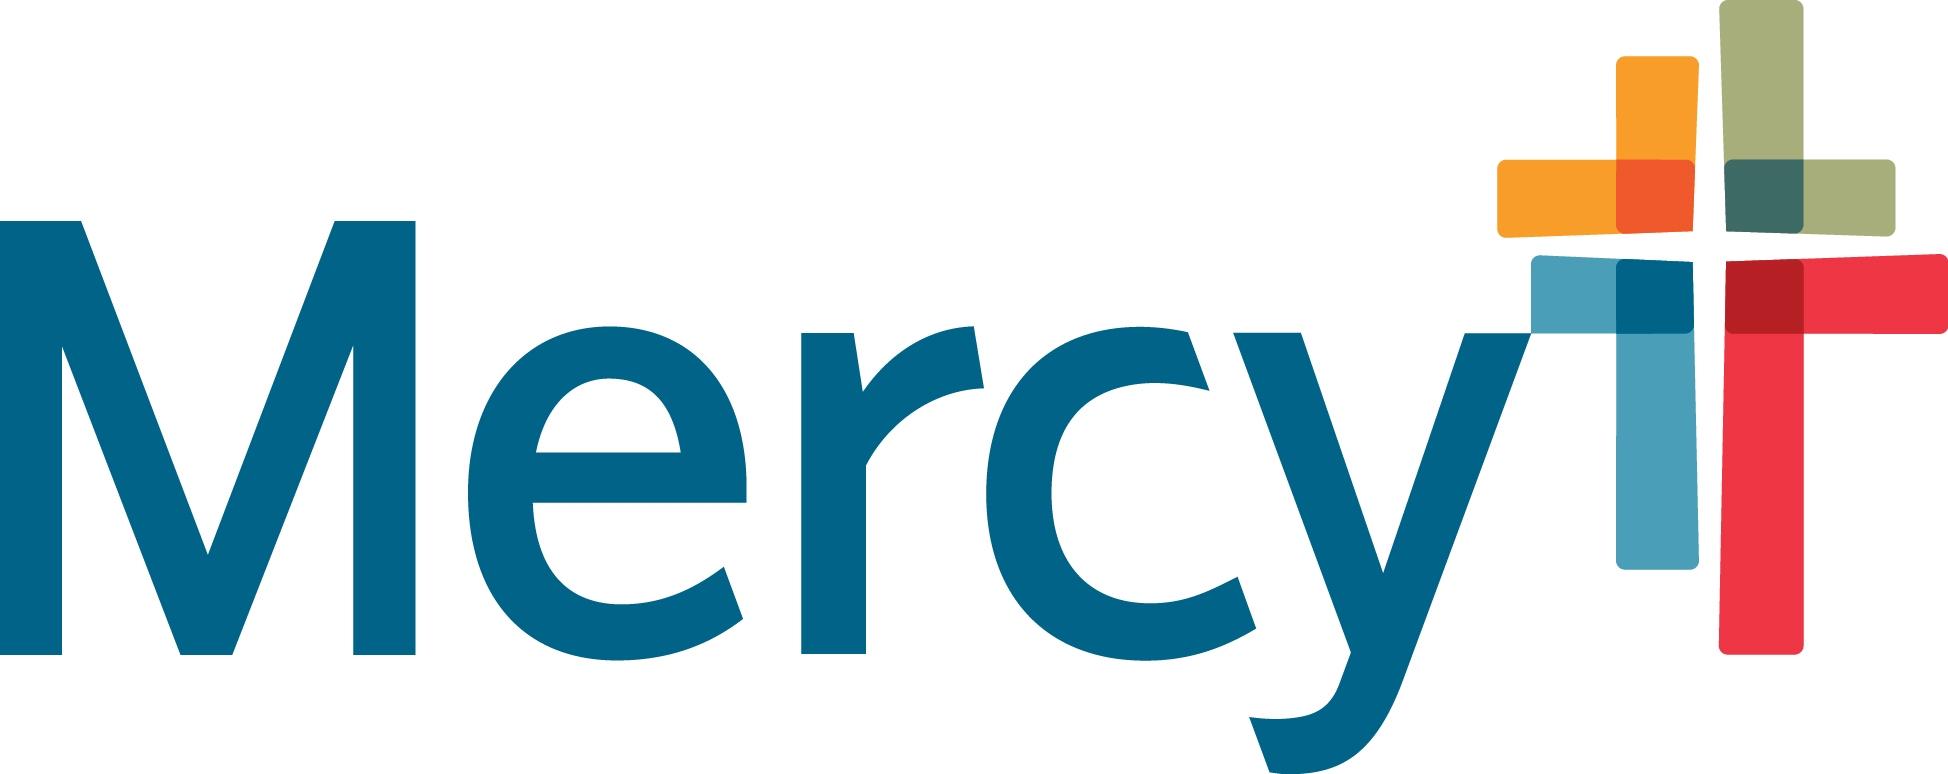 Mercy Hospital St. Louis